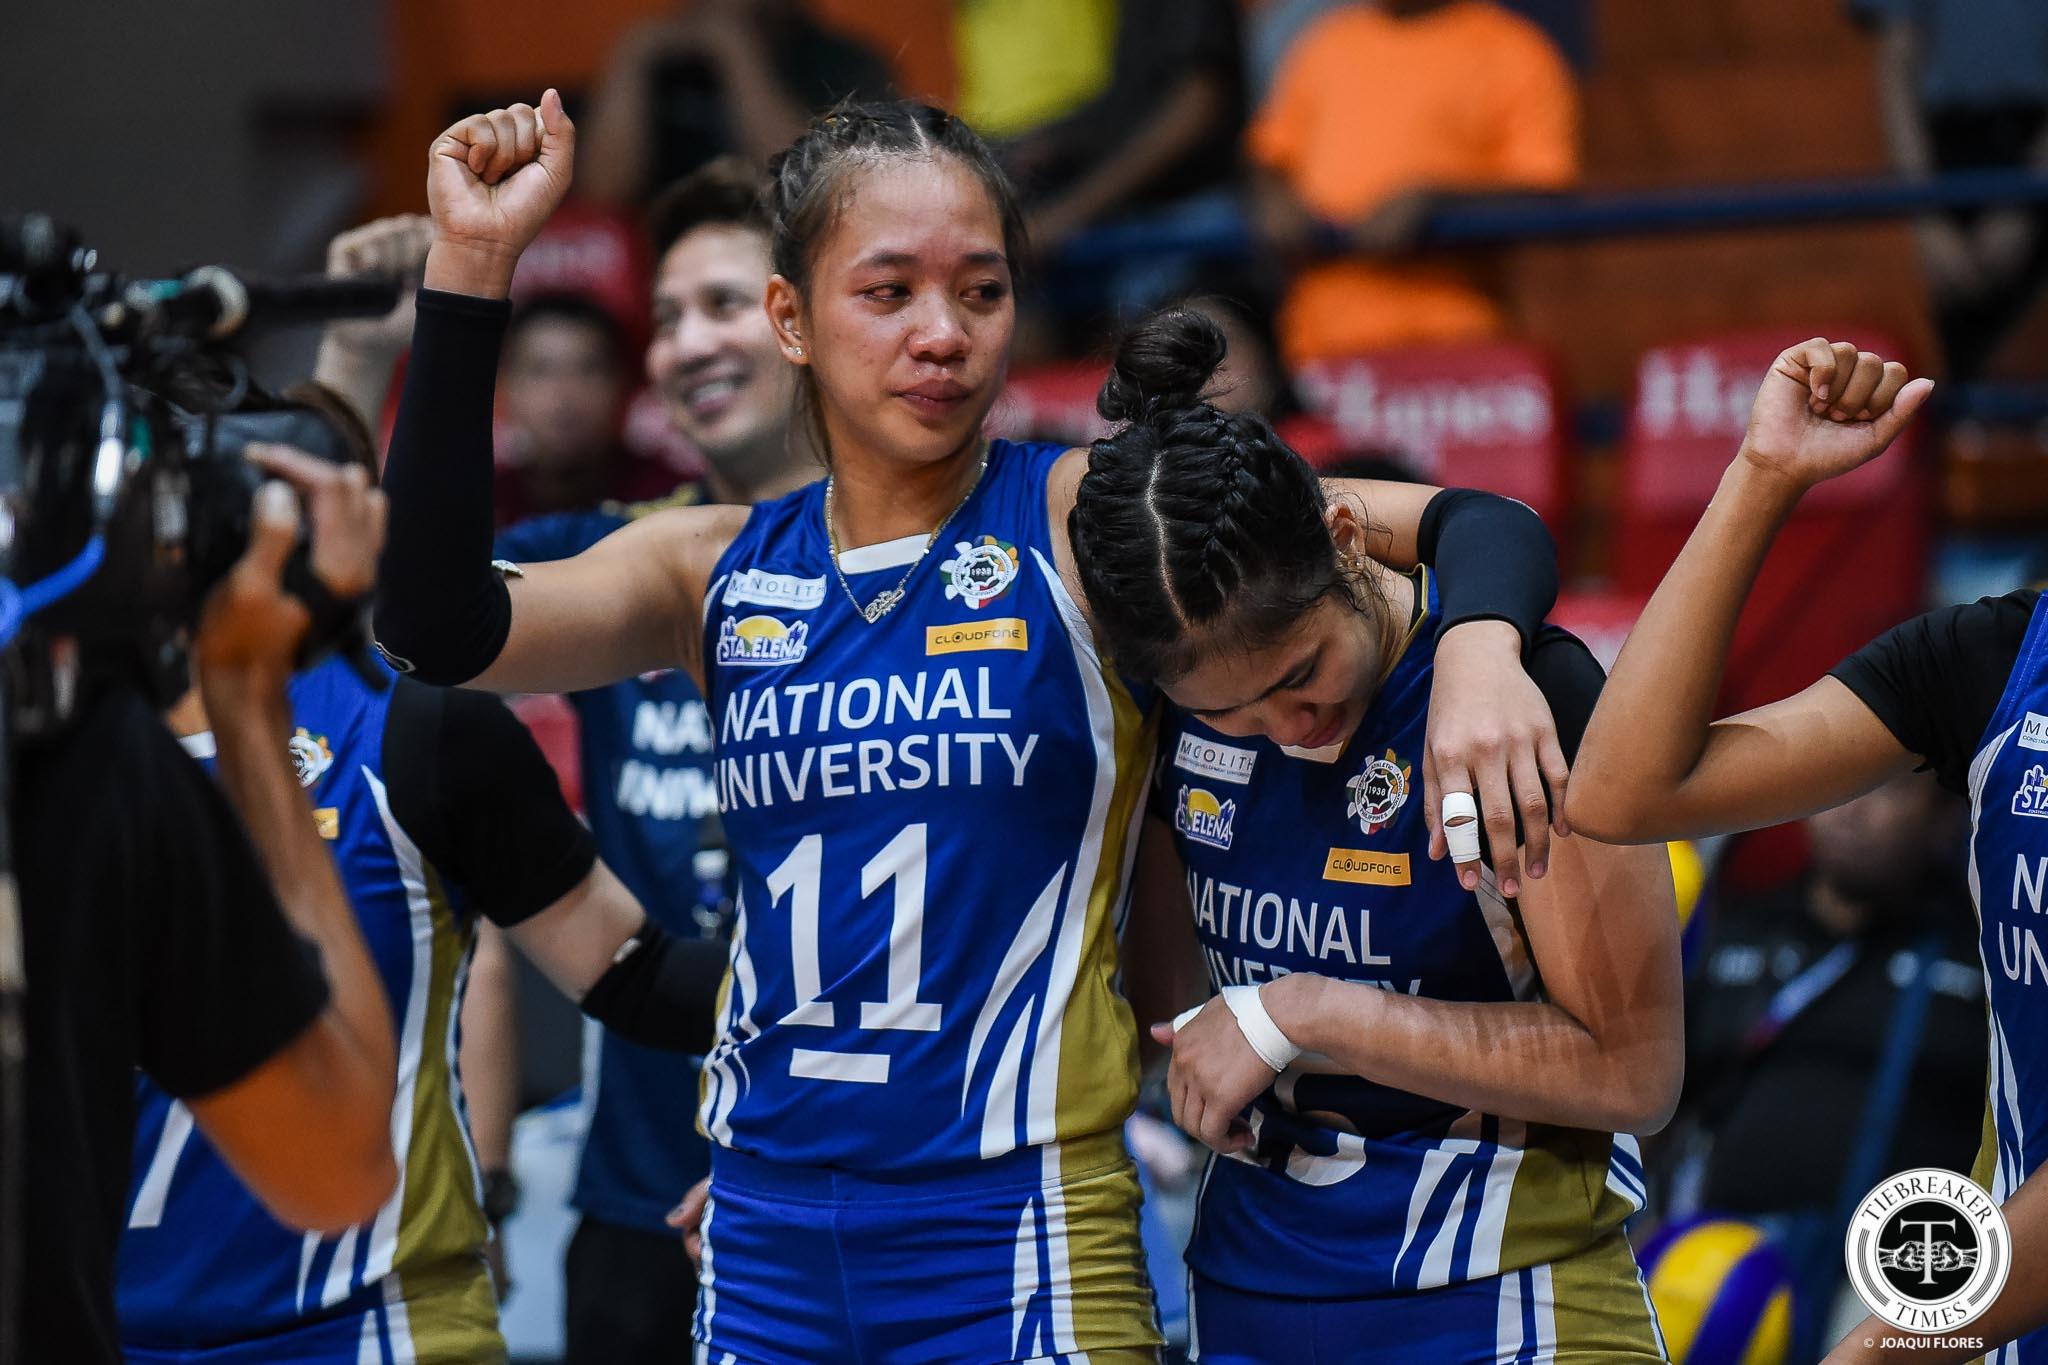 Tiebreaker Times Being Best or Second Best Blocker doesn't matter for Rose Doria News NU UAAP Volleyball  UAAP Season 81 Women's Volleyball UAAP Season 81 Rose Doria NU Women's Volleyball